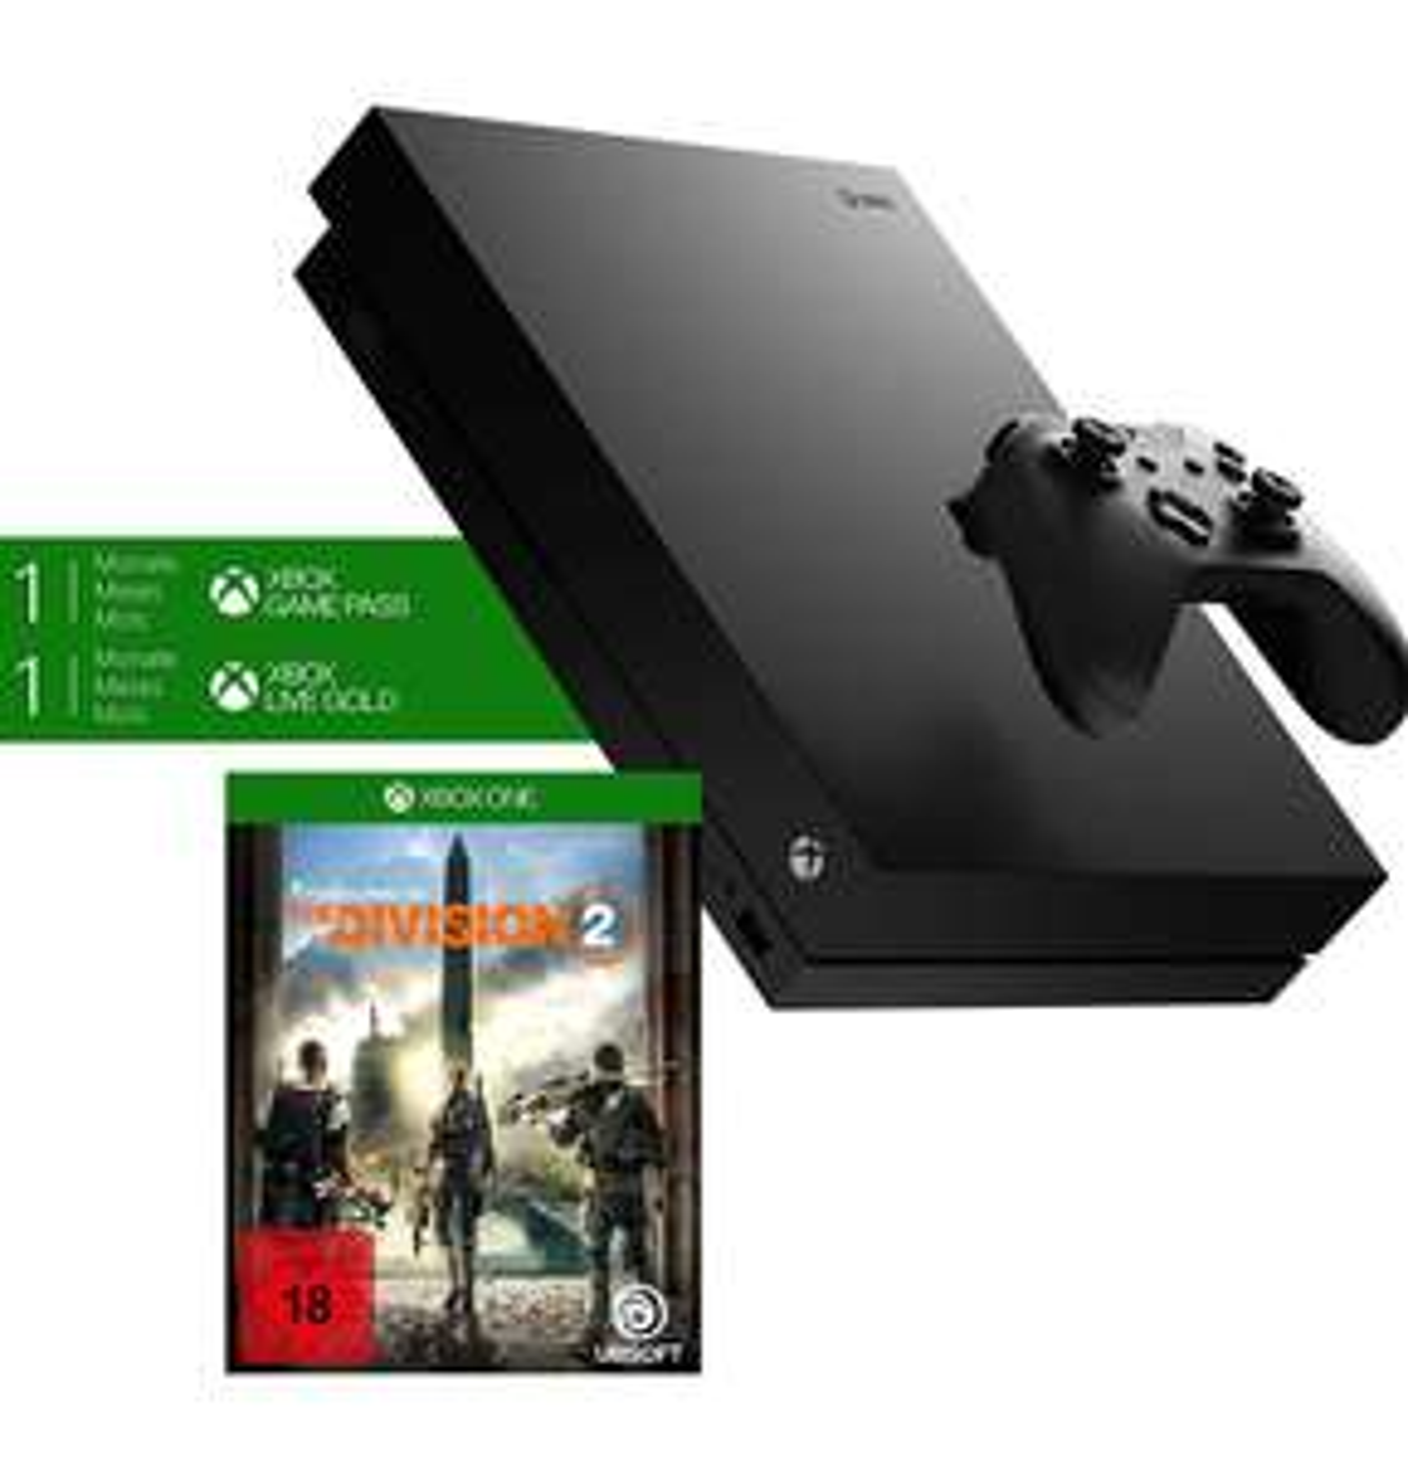 Xbox One X 1TB, czarna - The Division 2. Amazon.de